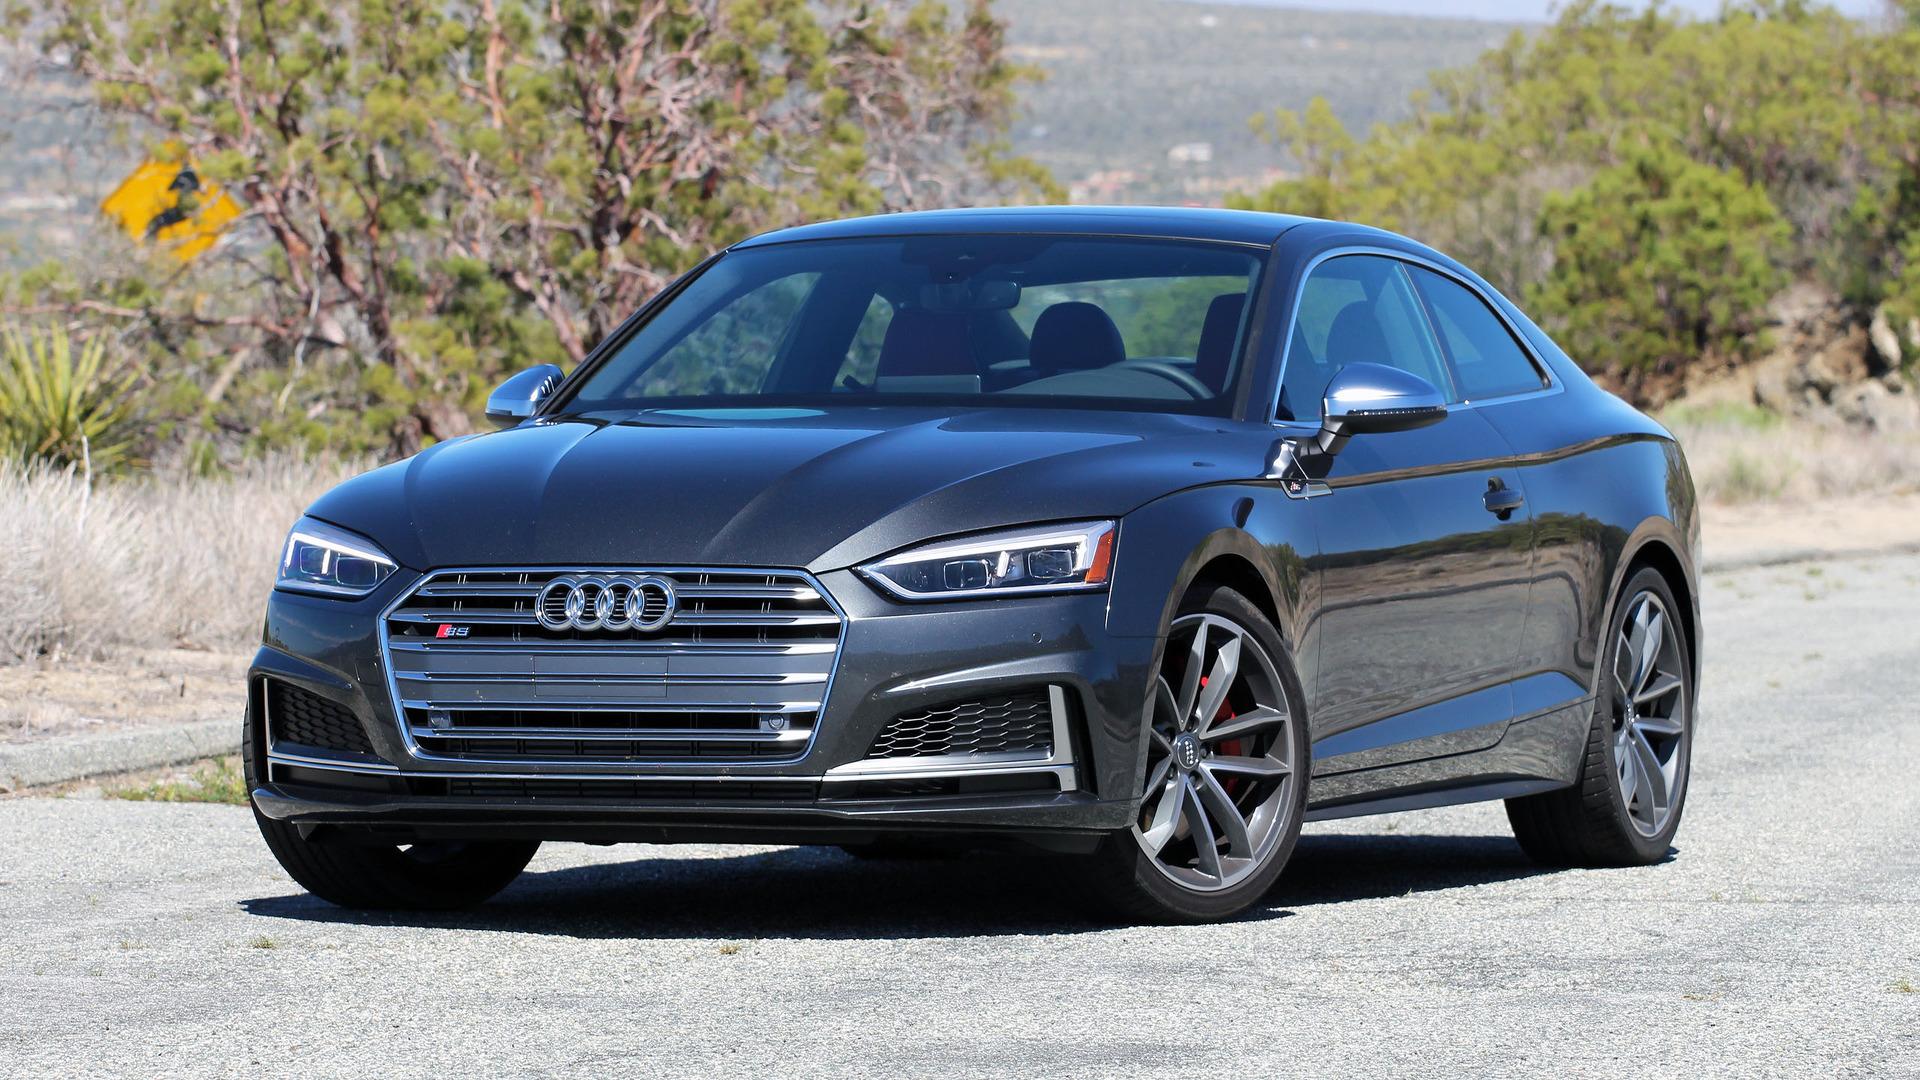 Audi S Coupe Review Less Sport More GT - 2018 audi s5 horsepower